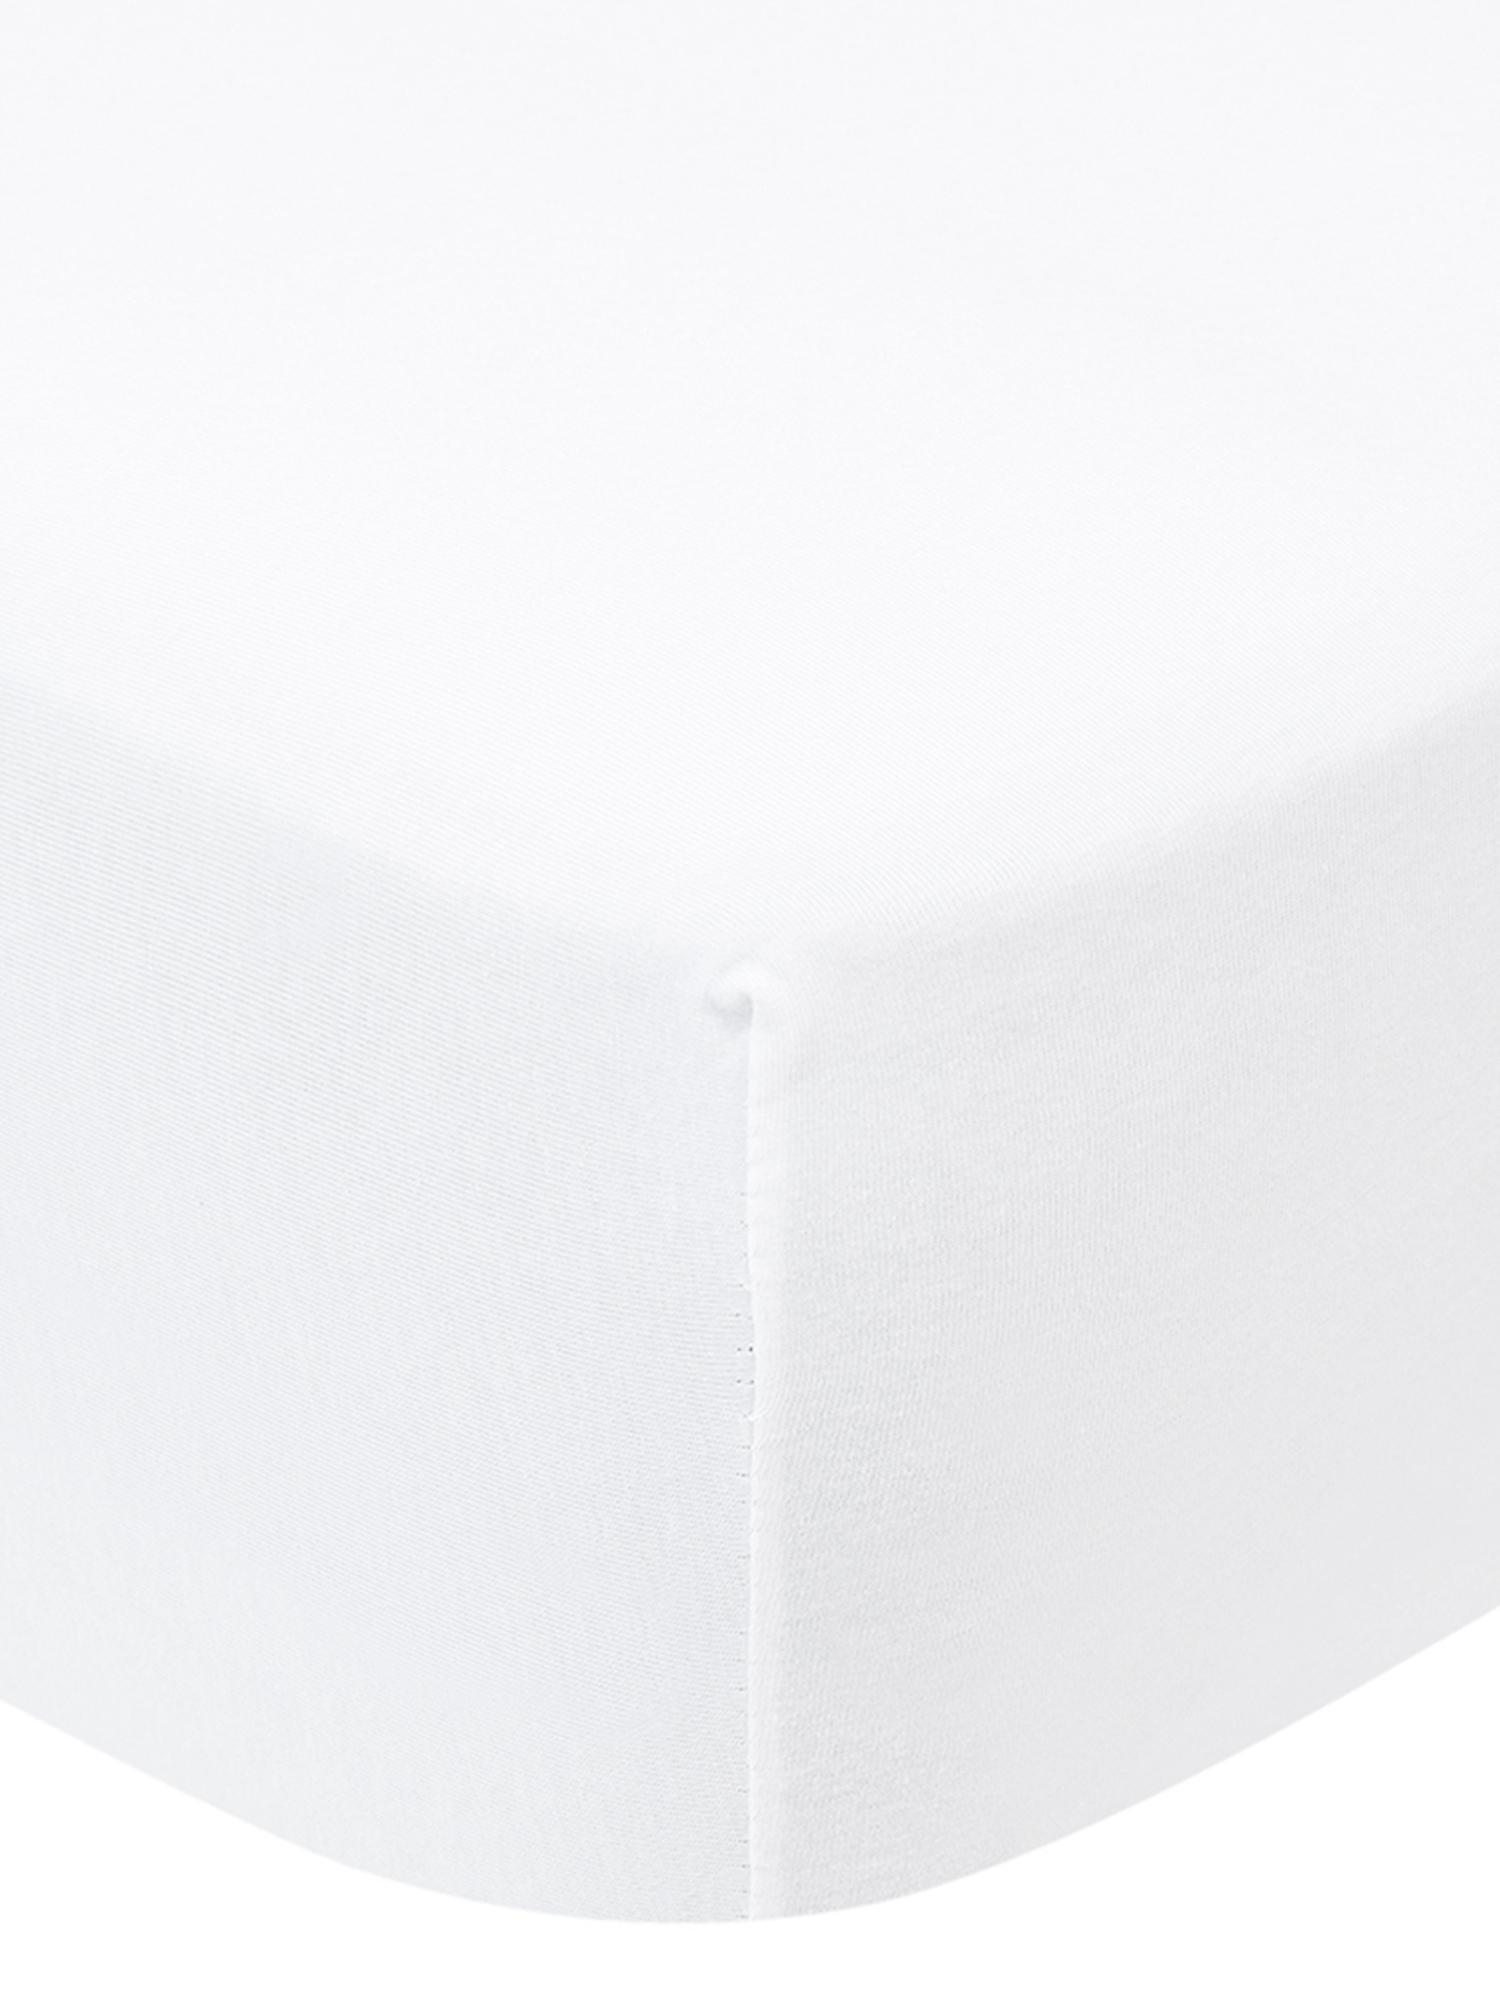 Sábana bajera de jersey con elastano Lara, 95%algodón, 5%elastano, Blanco, Cama 150 cm (160 x 200 cm)